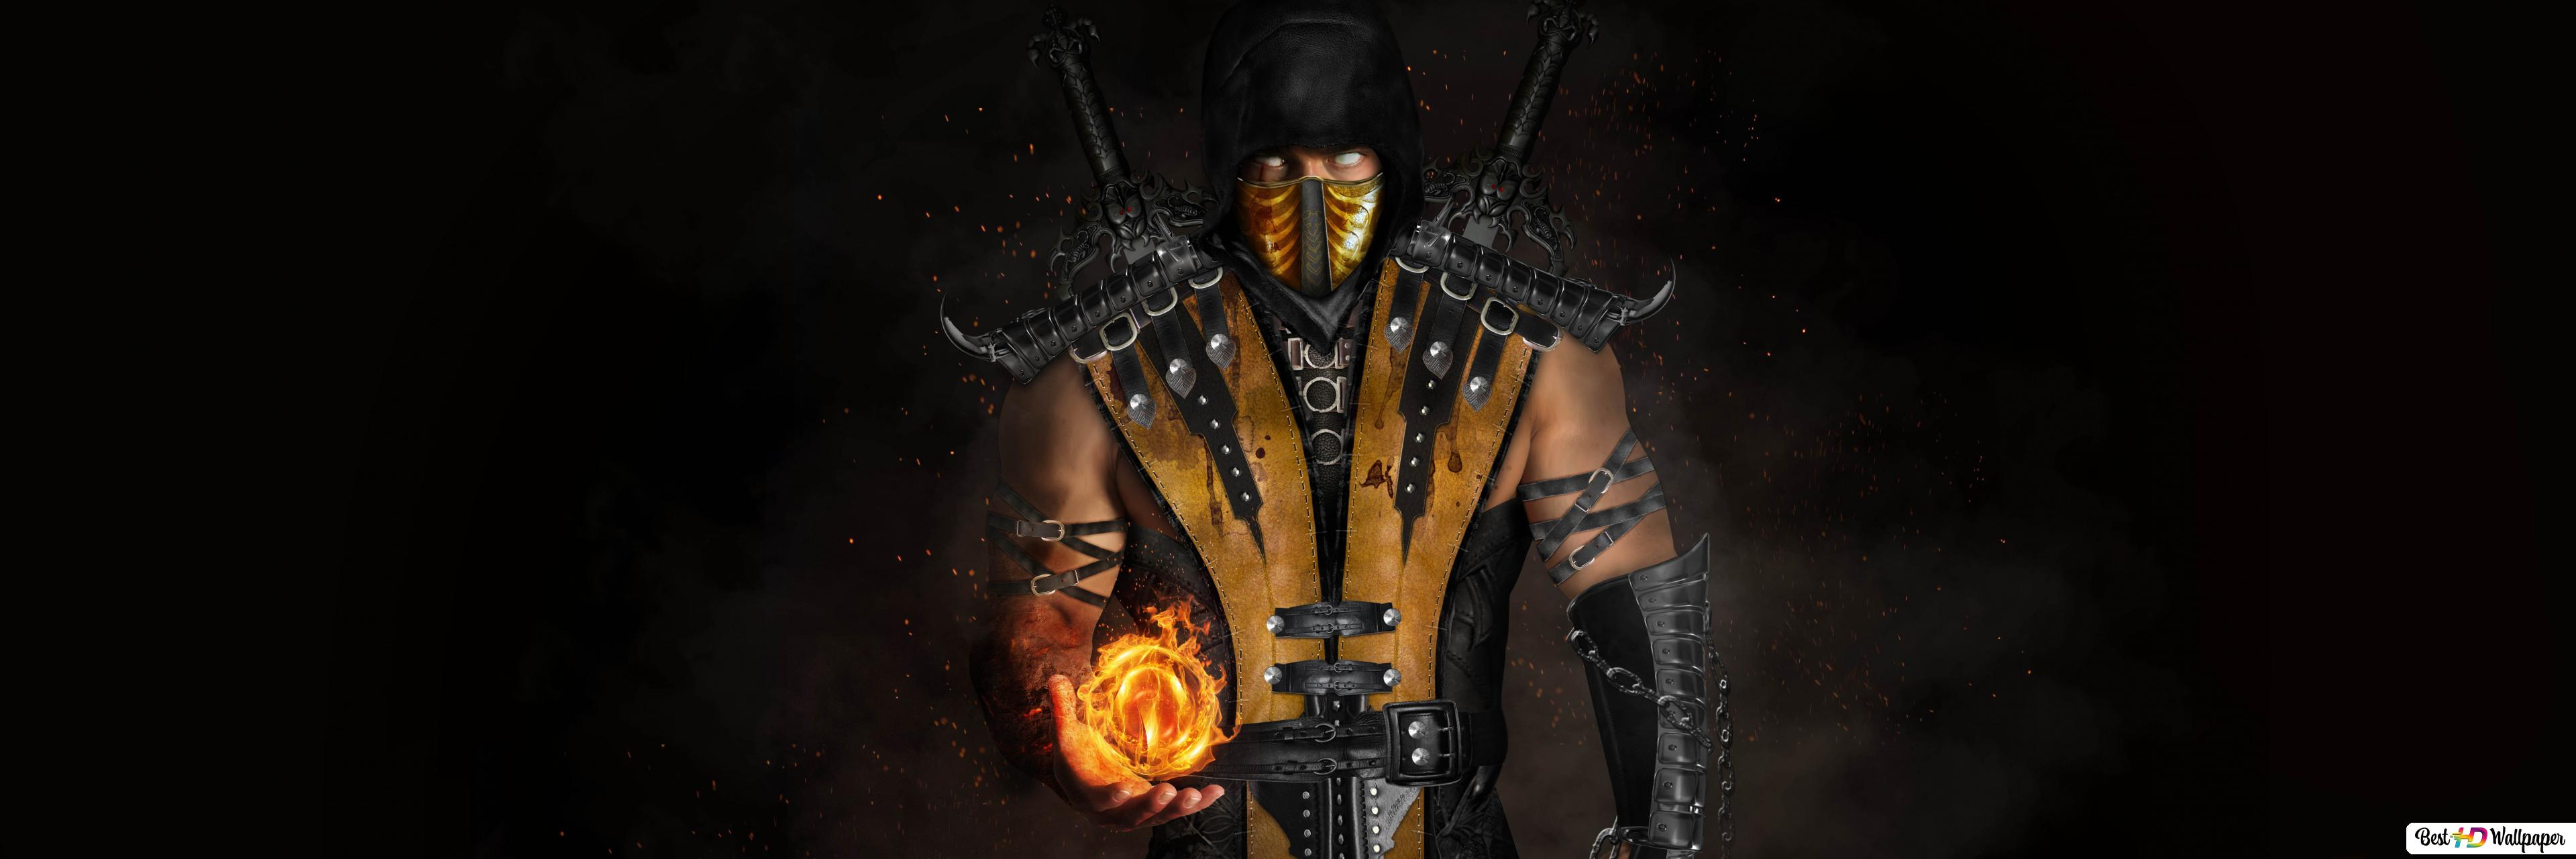 Mortal Kombat X Scorpion Hd Wallpaper Download